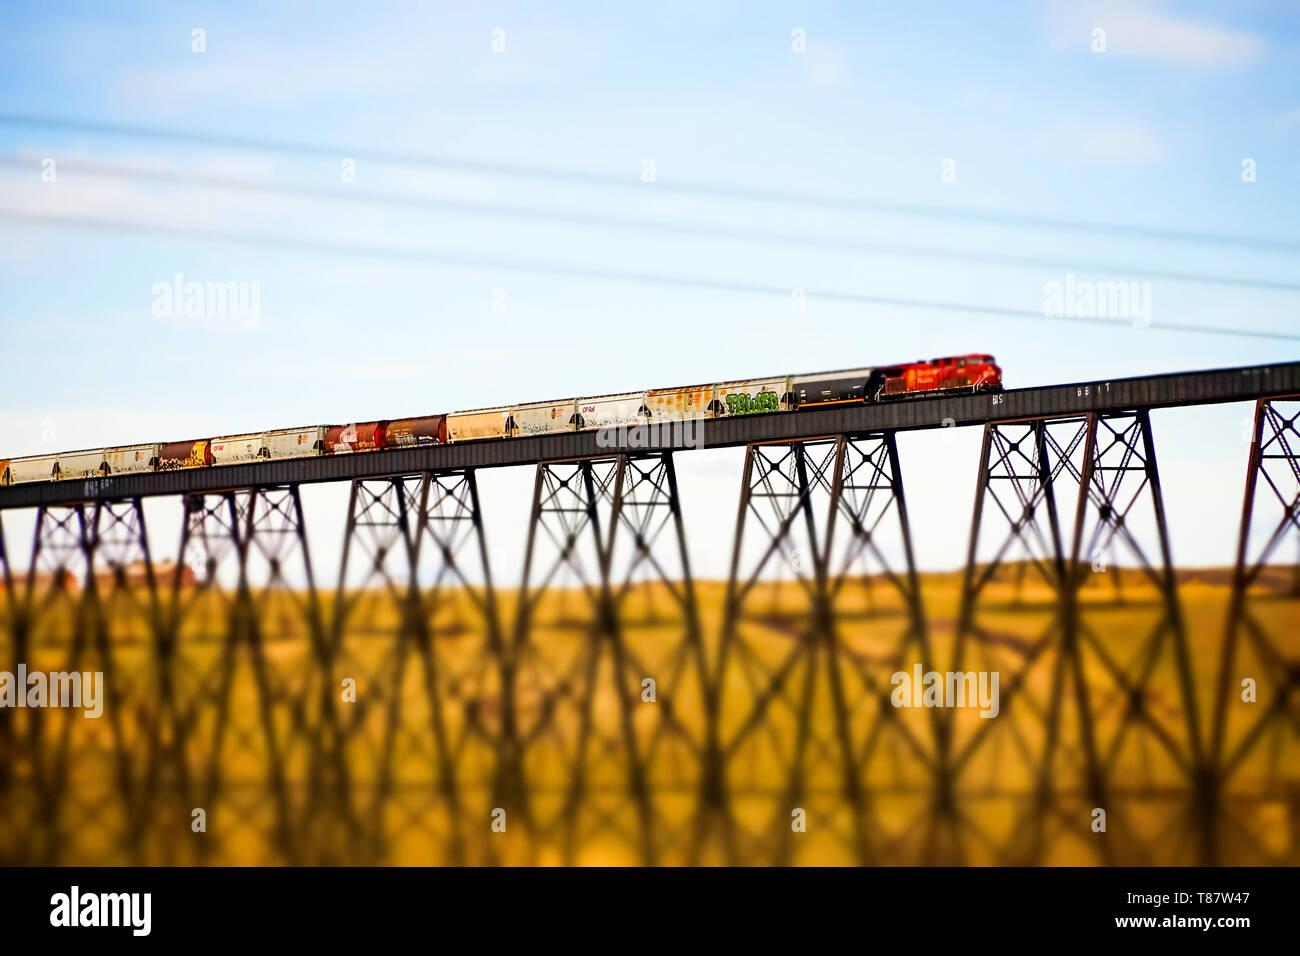 April 7 2019 - Lethbridge , Alberta Canada - Canadian Pacific Railway train crossing the High Level Bridge Stock Photo